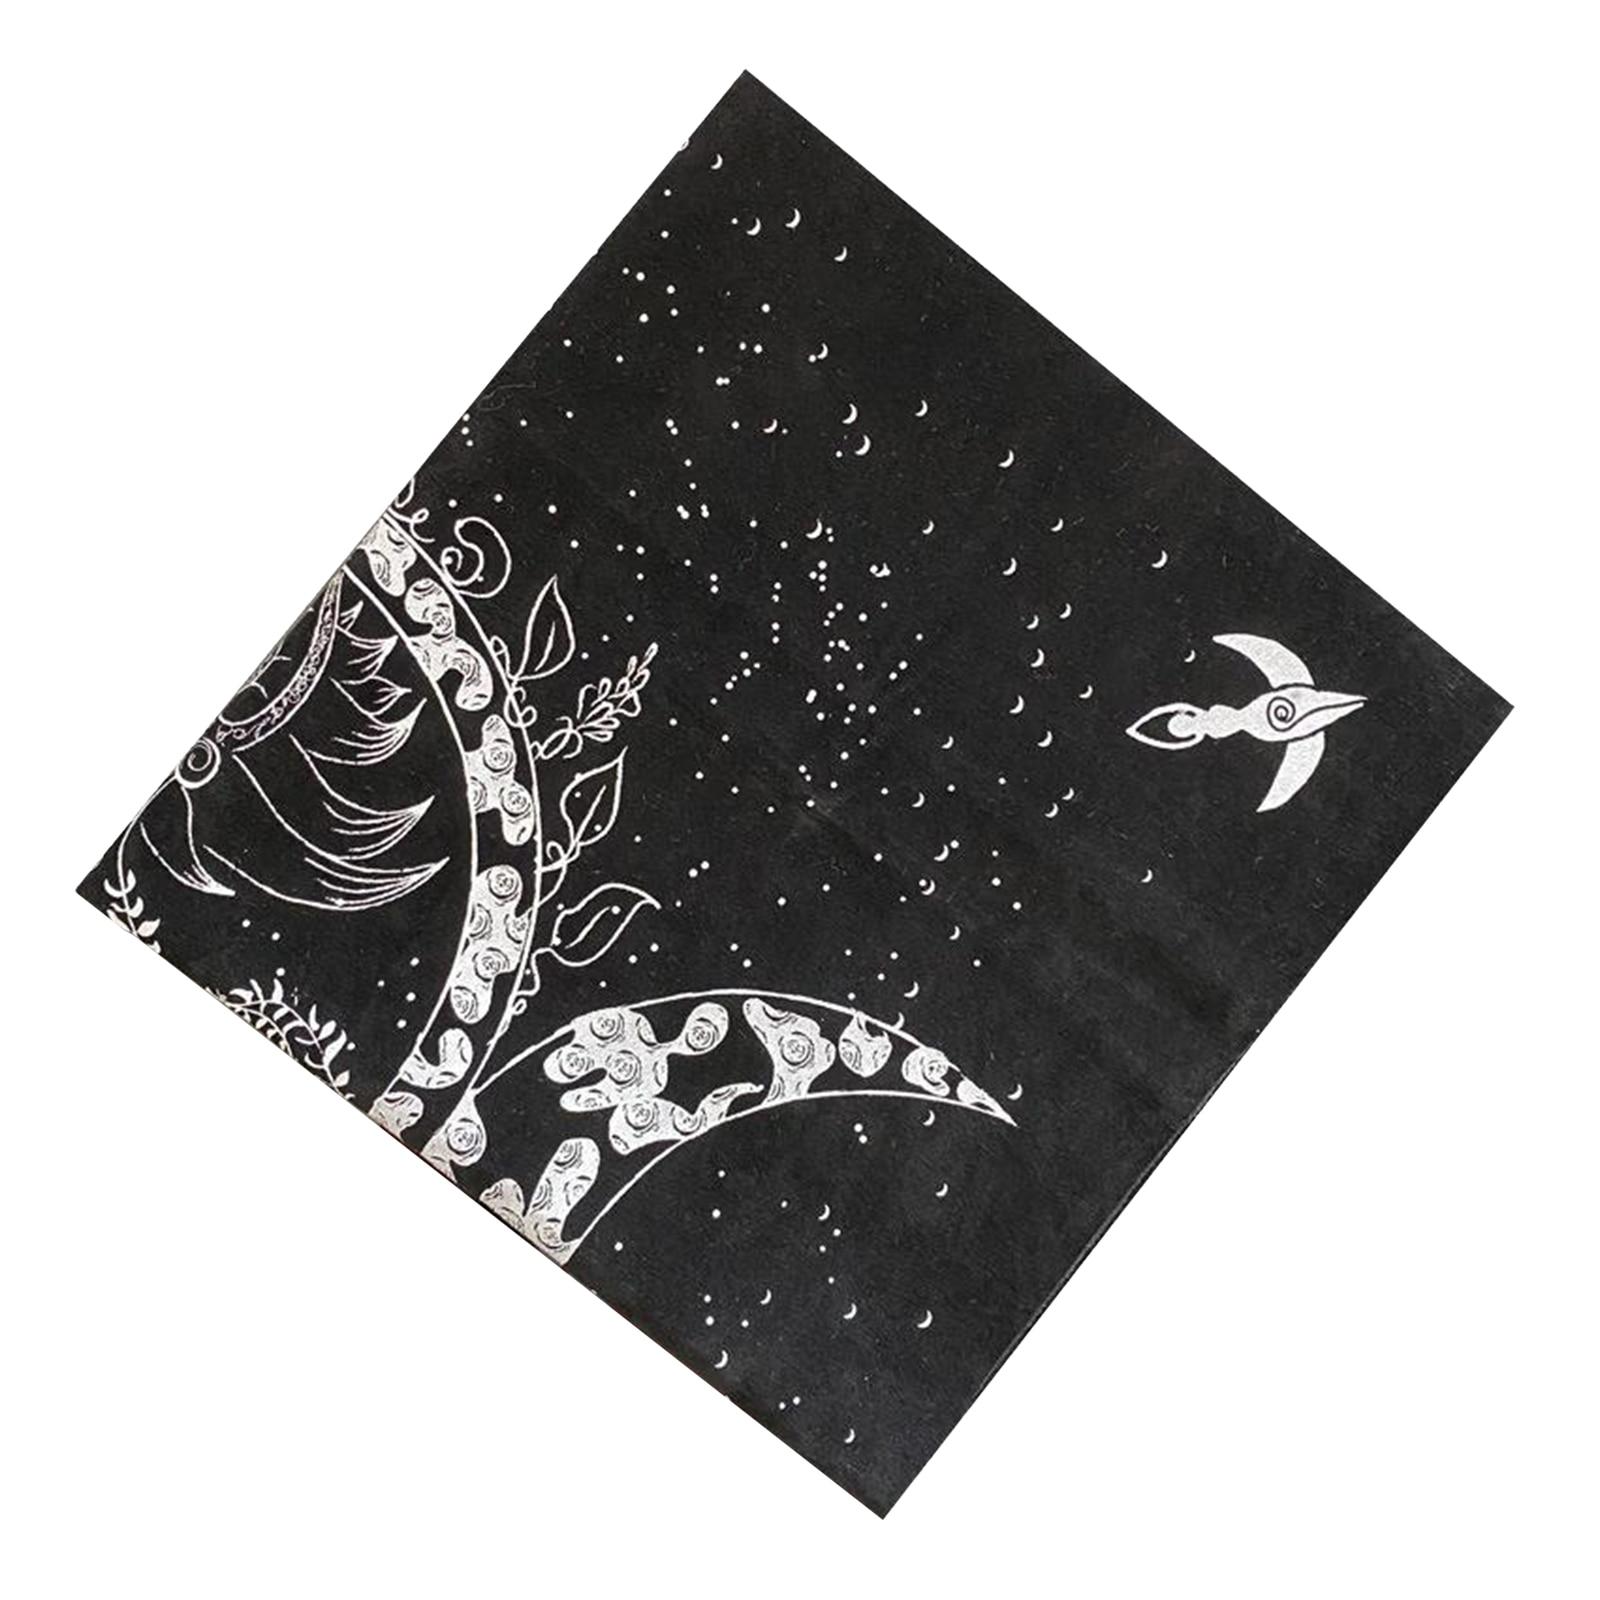 Altar Tarots Cloth Triple Goddess Moon Phases Astrology Tarots Cards Divination Special Tablecloth Velvet 19